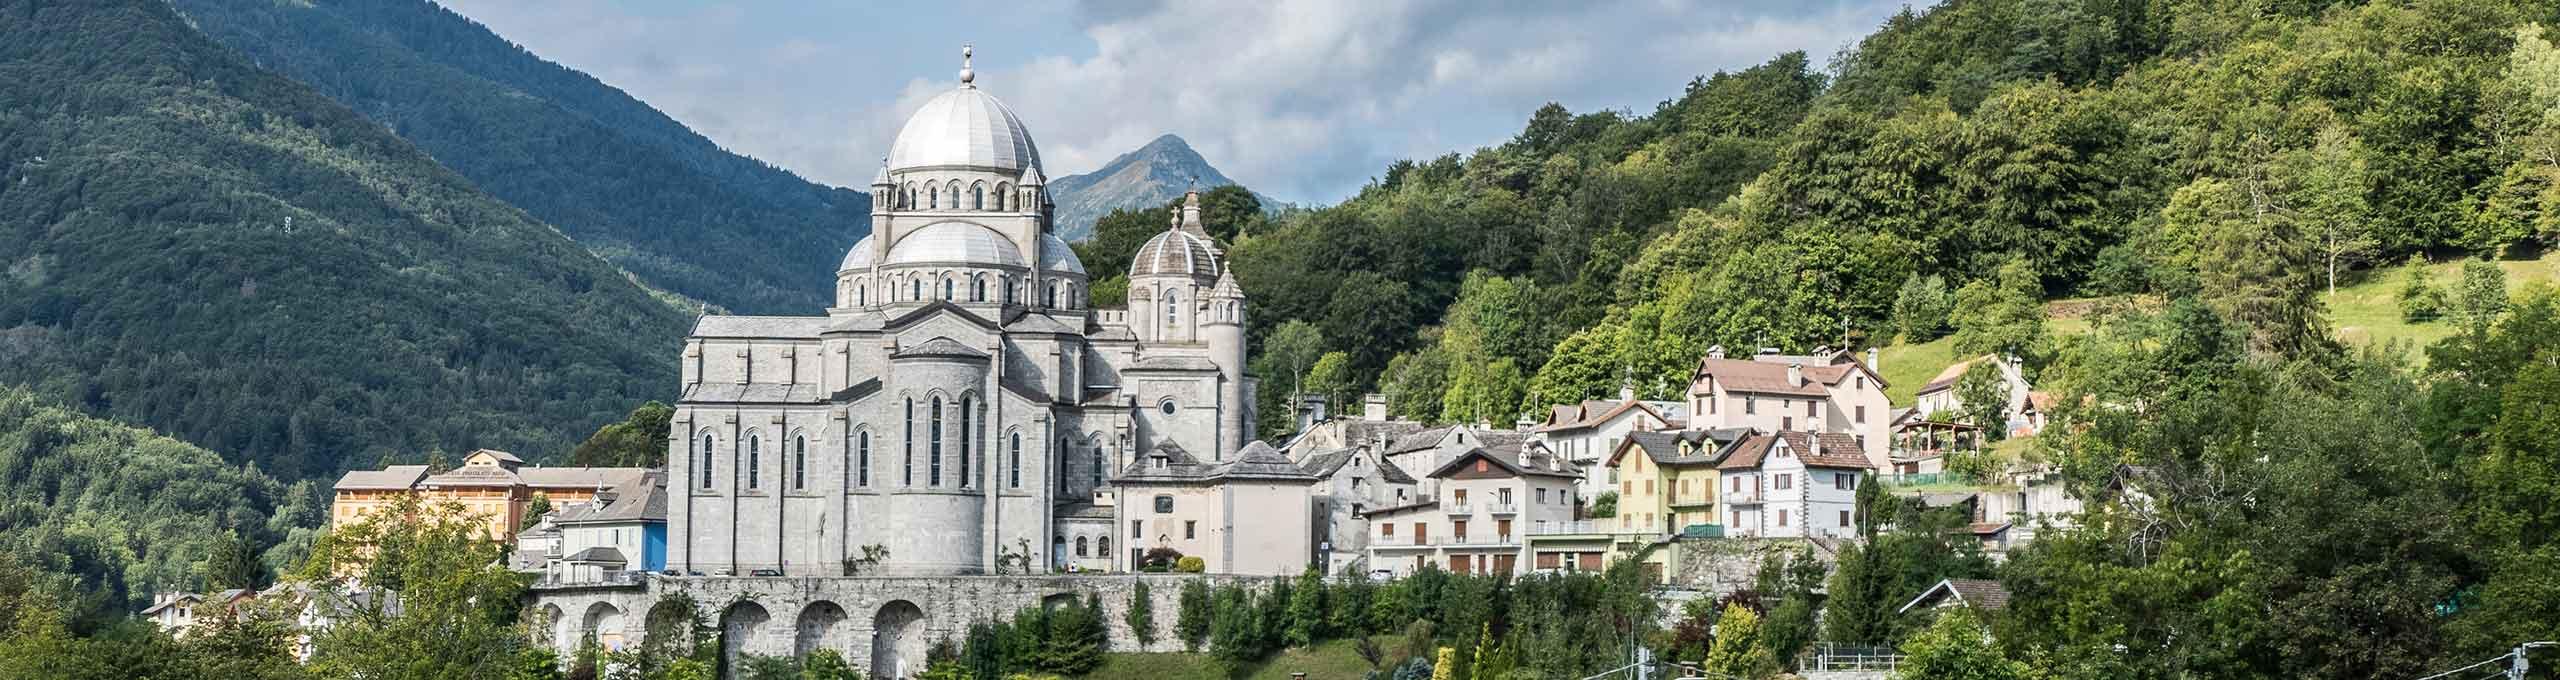 Re, Val D'Ossola, Santuario